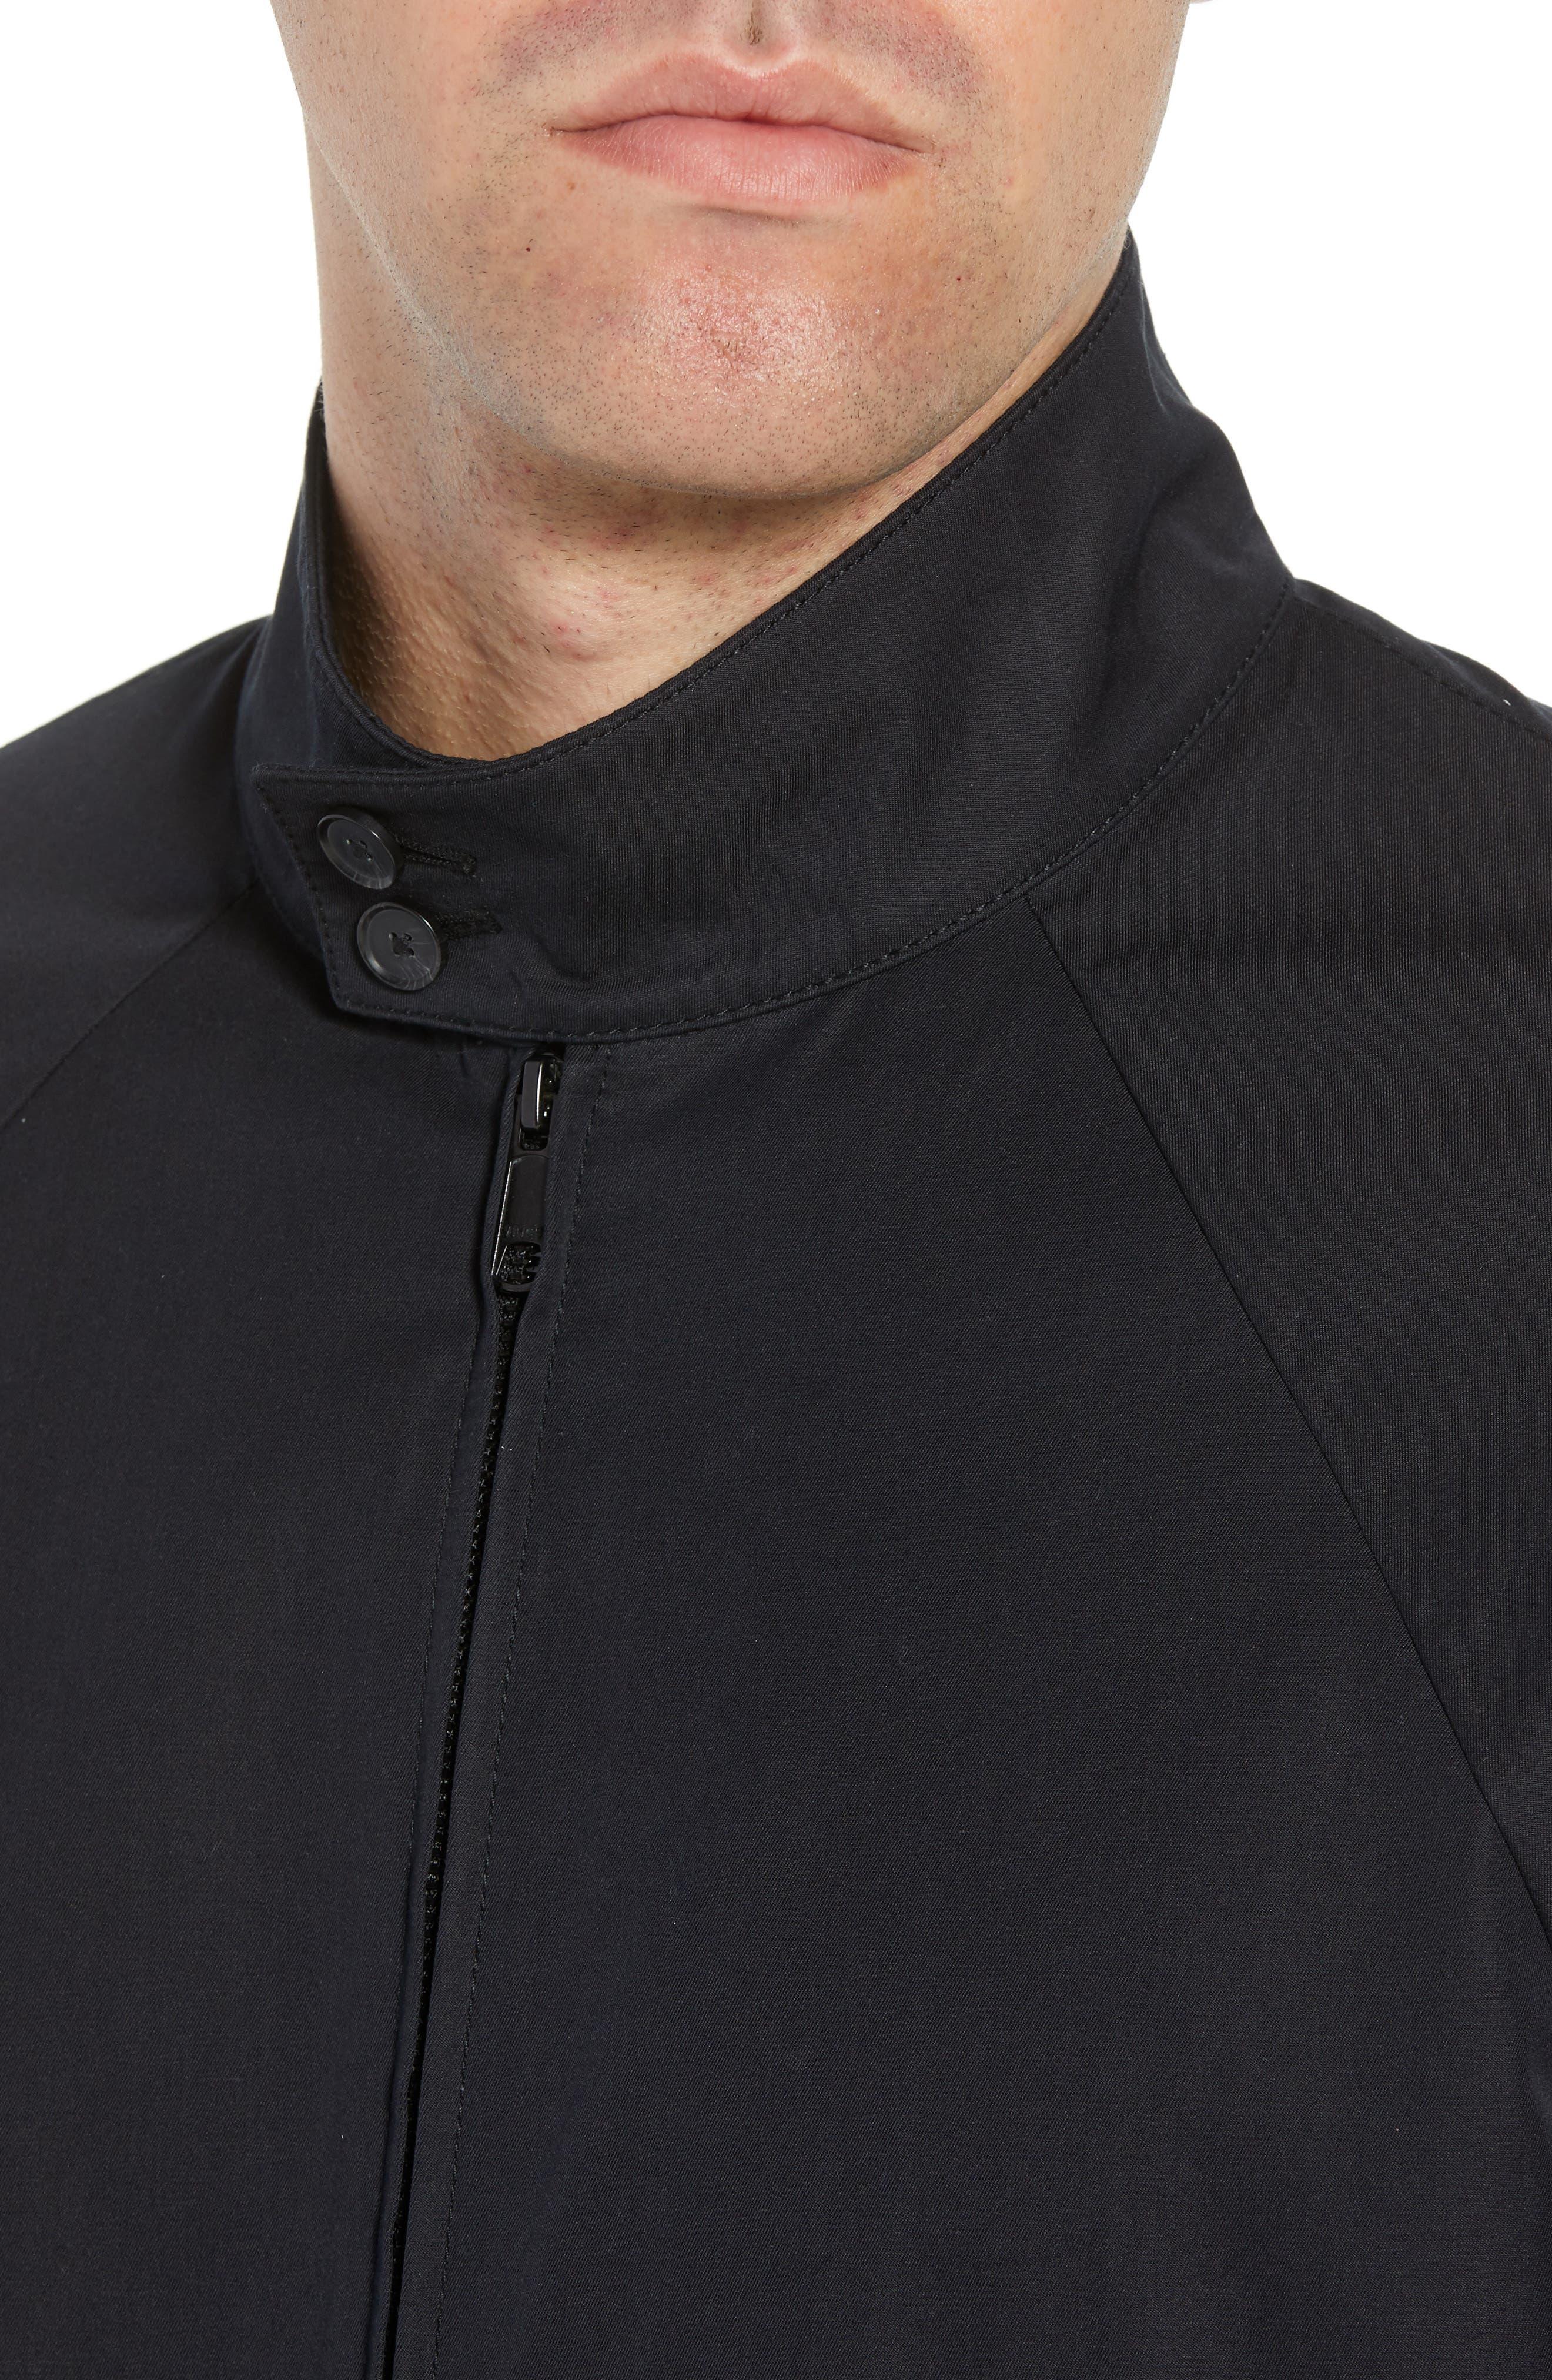 Regular Fit Jacket,                             Alternate thumbnail 4, color,                             Black